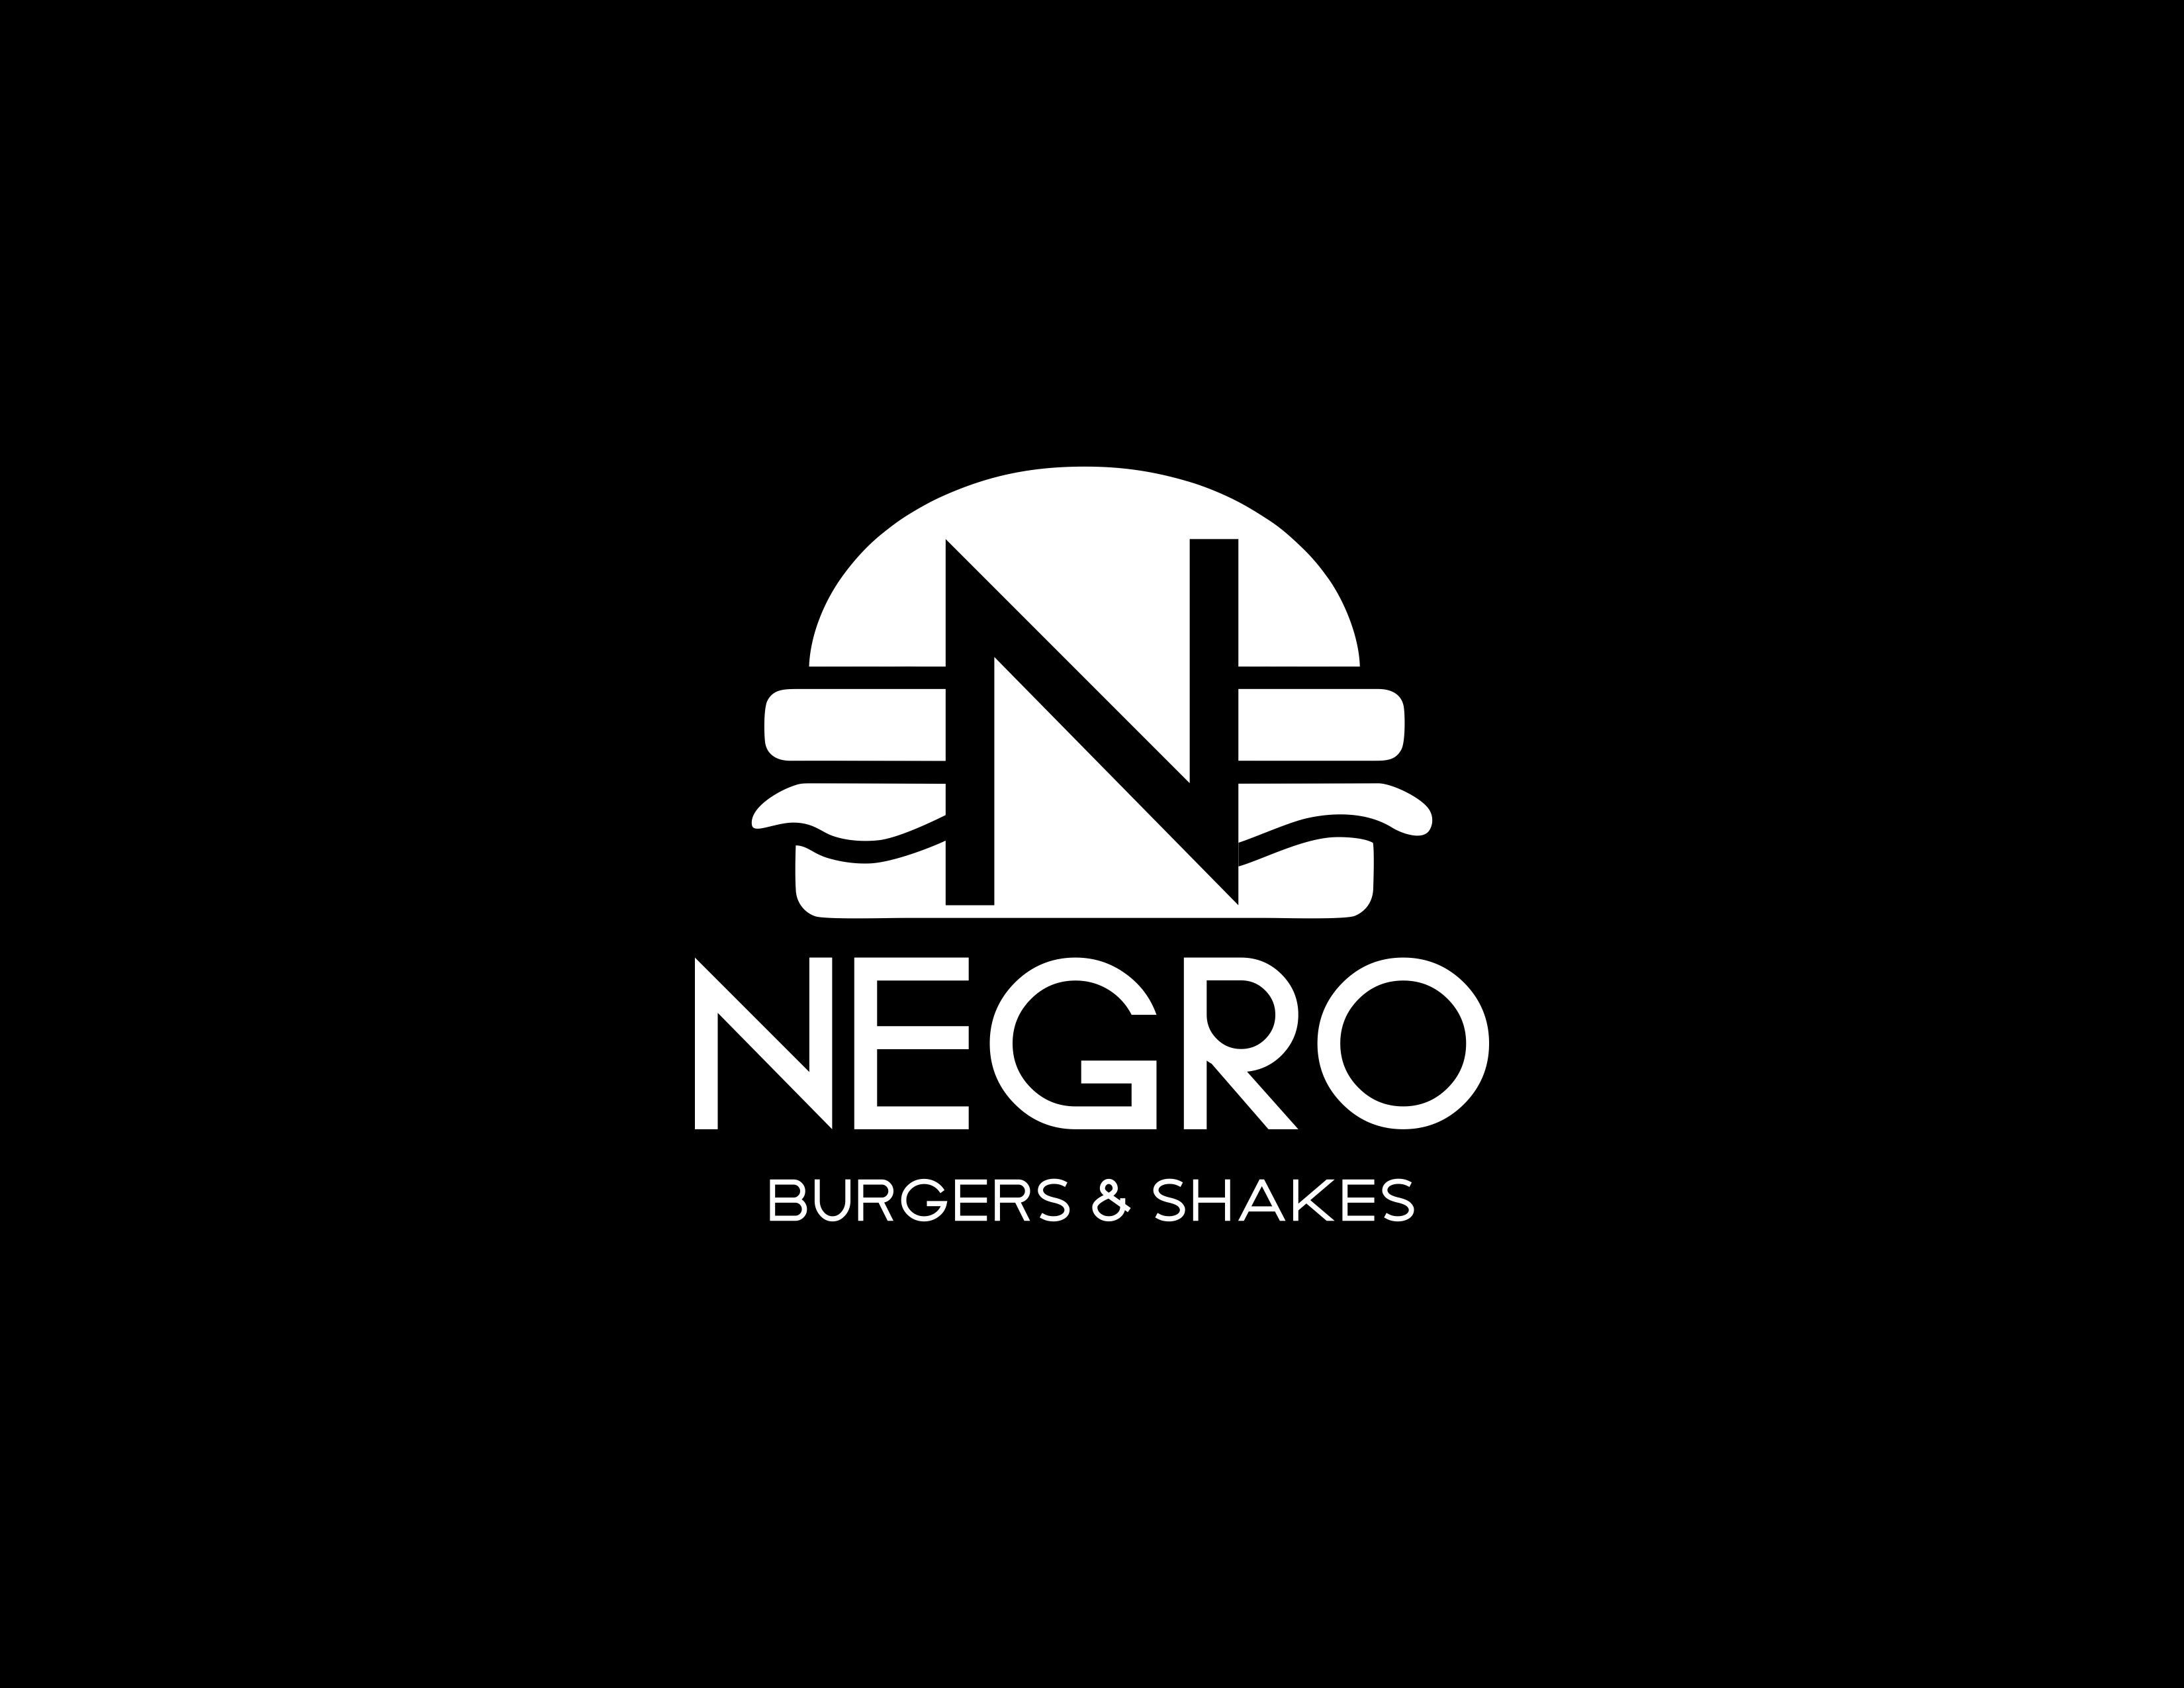 Negro Burgers and Shakes